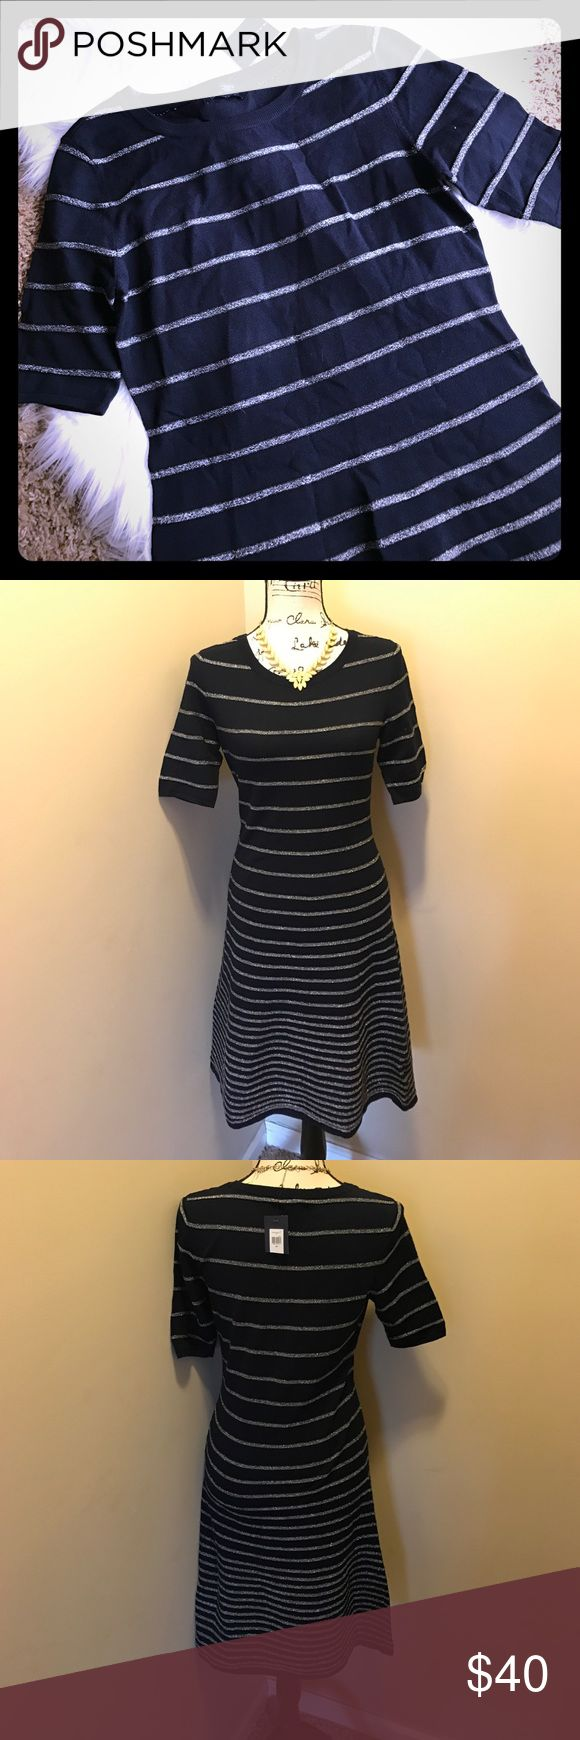 NWT short sleeve Tommy Hilfiger dress NWT short sleeve Tommy Hilfiger dress. Navy with silver stripes Tommy Hilfiger Dresses